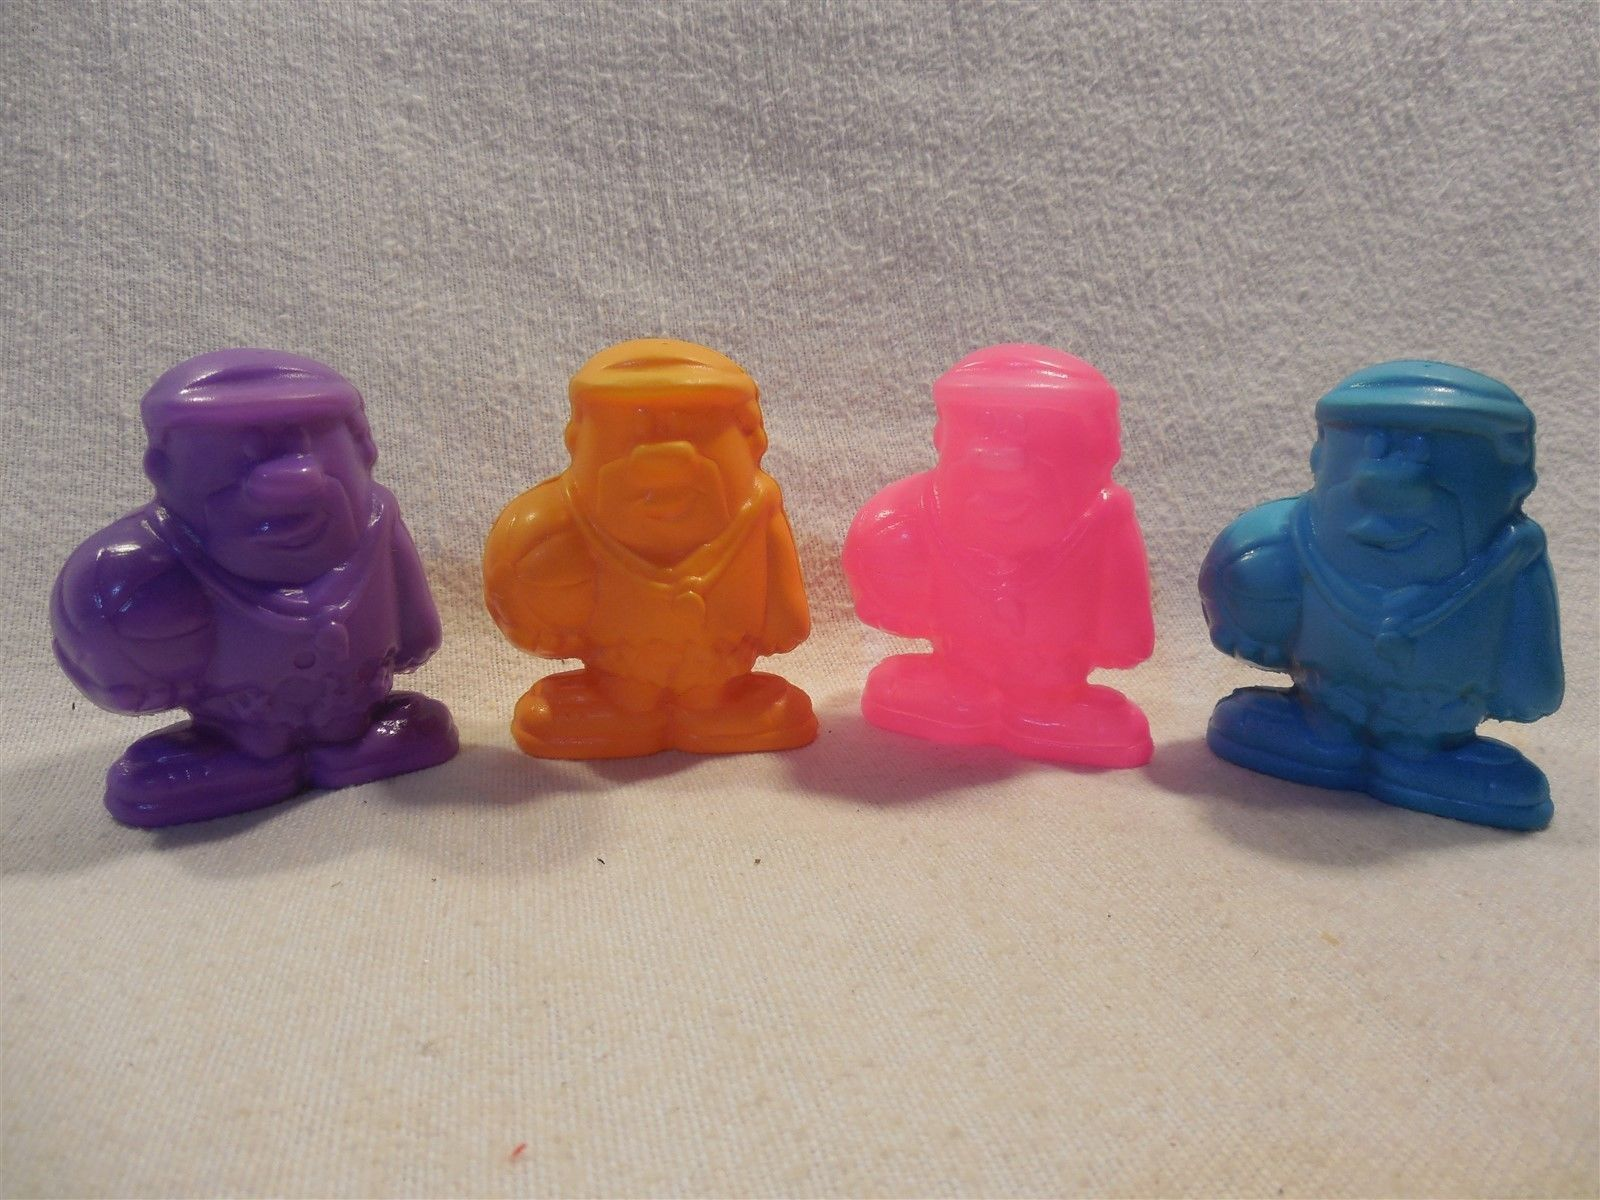 Flintstones 1990 Post Pebbles Cereal Premium Set 4 Vinyl Barney Rubble Squirters